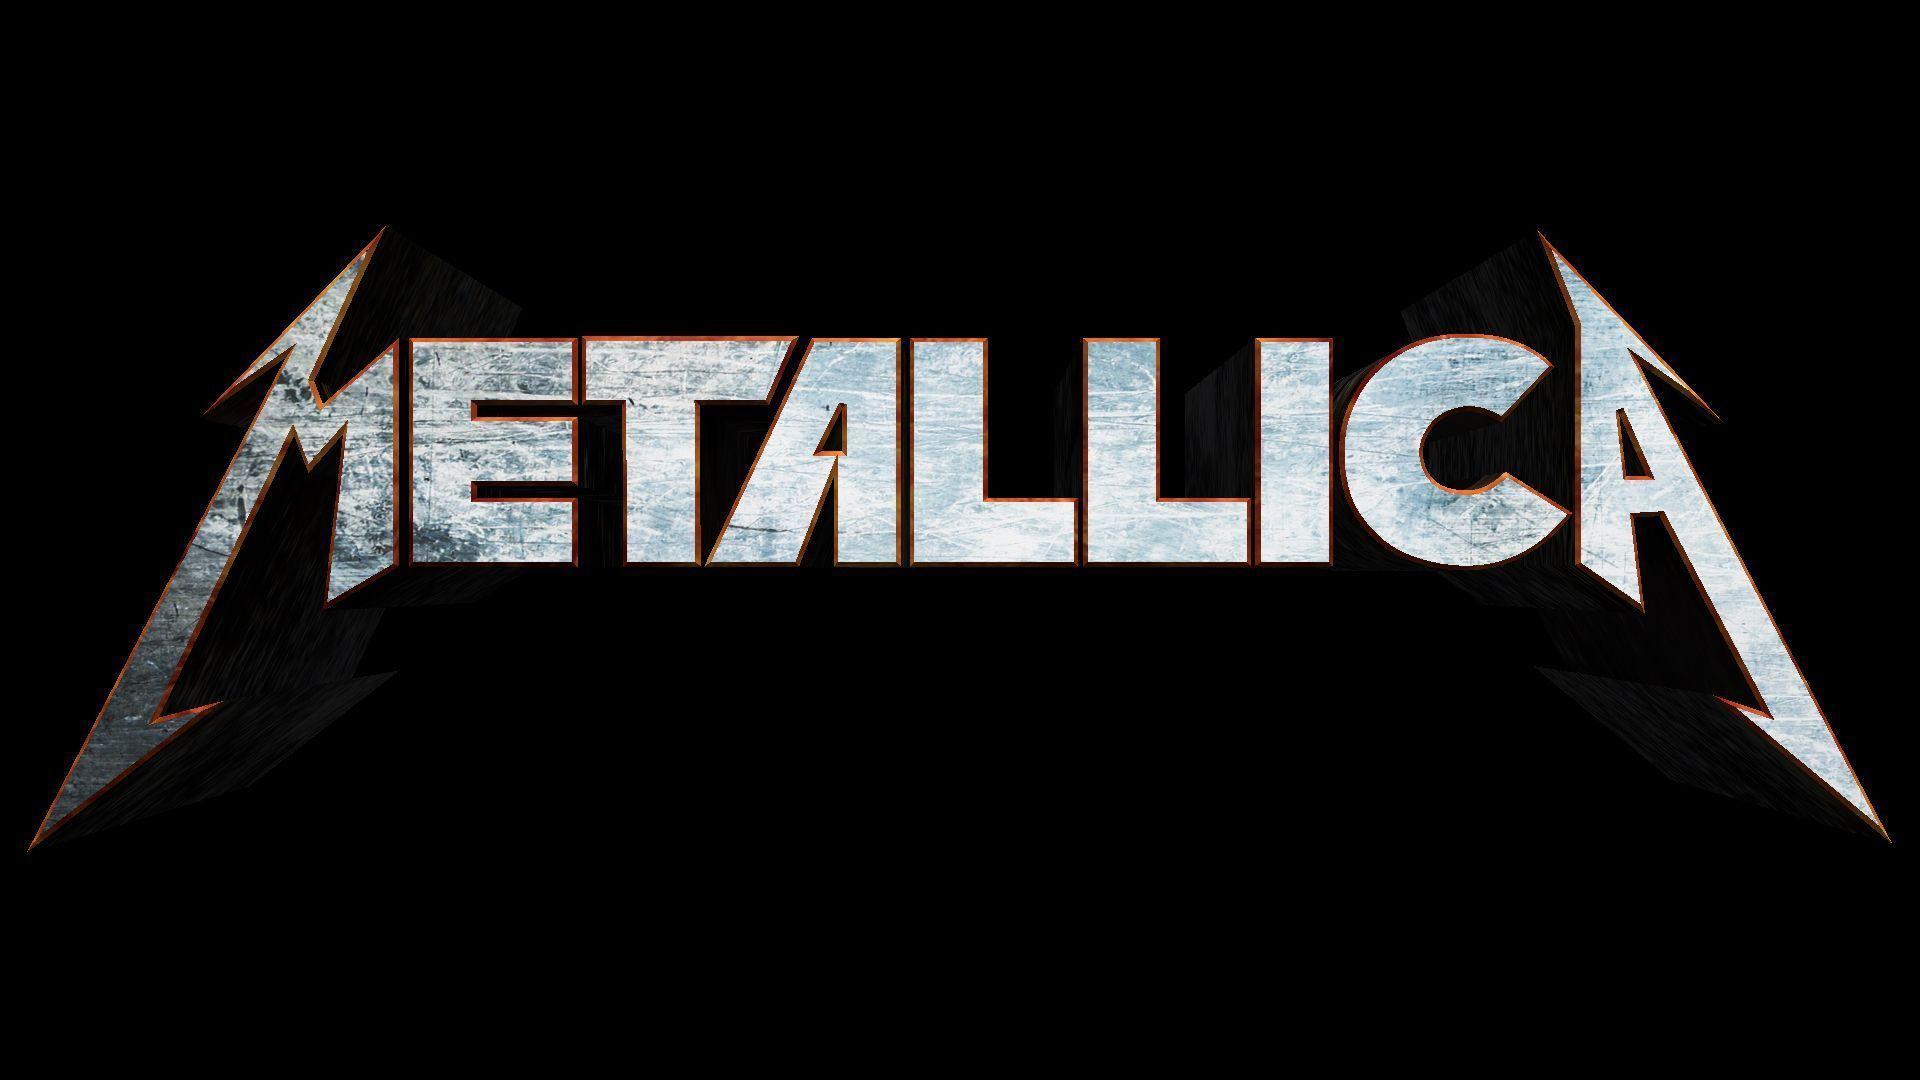 Metallica the black album wallpapers wallpaper cave - Metallica wallpaper ...